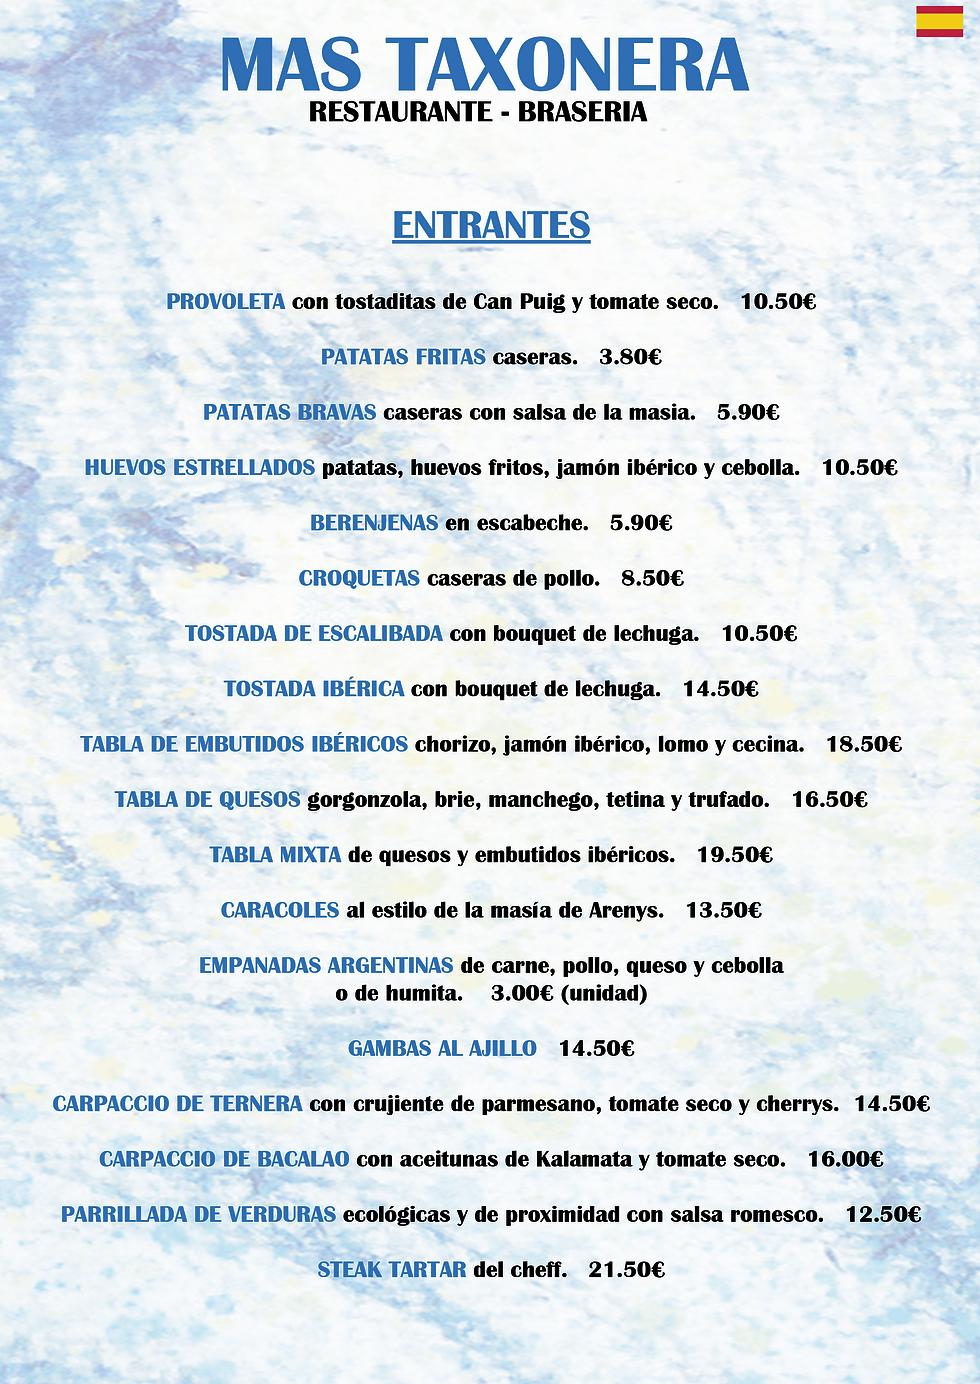 carta 1 CASTELLANO 2021.png